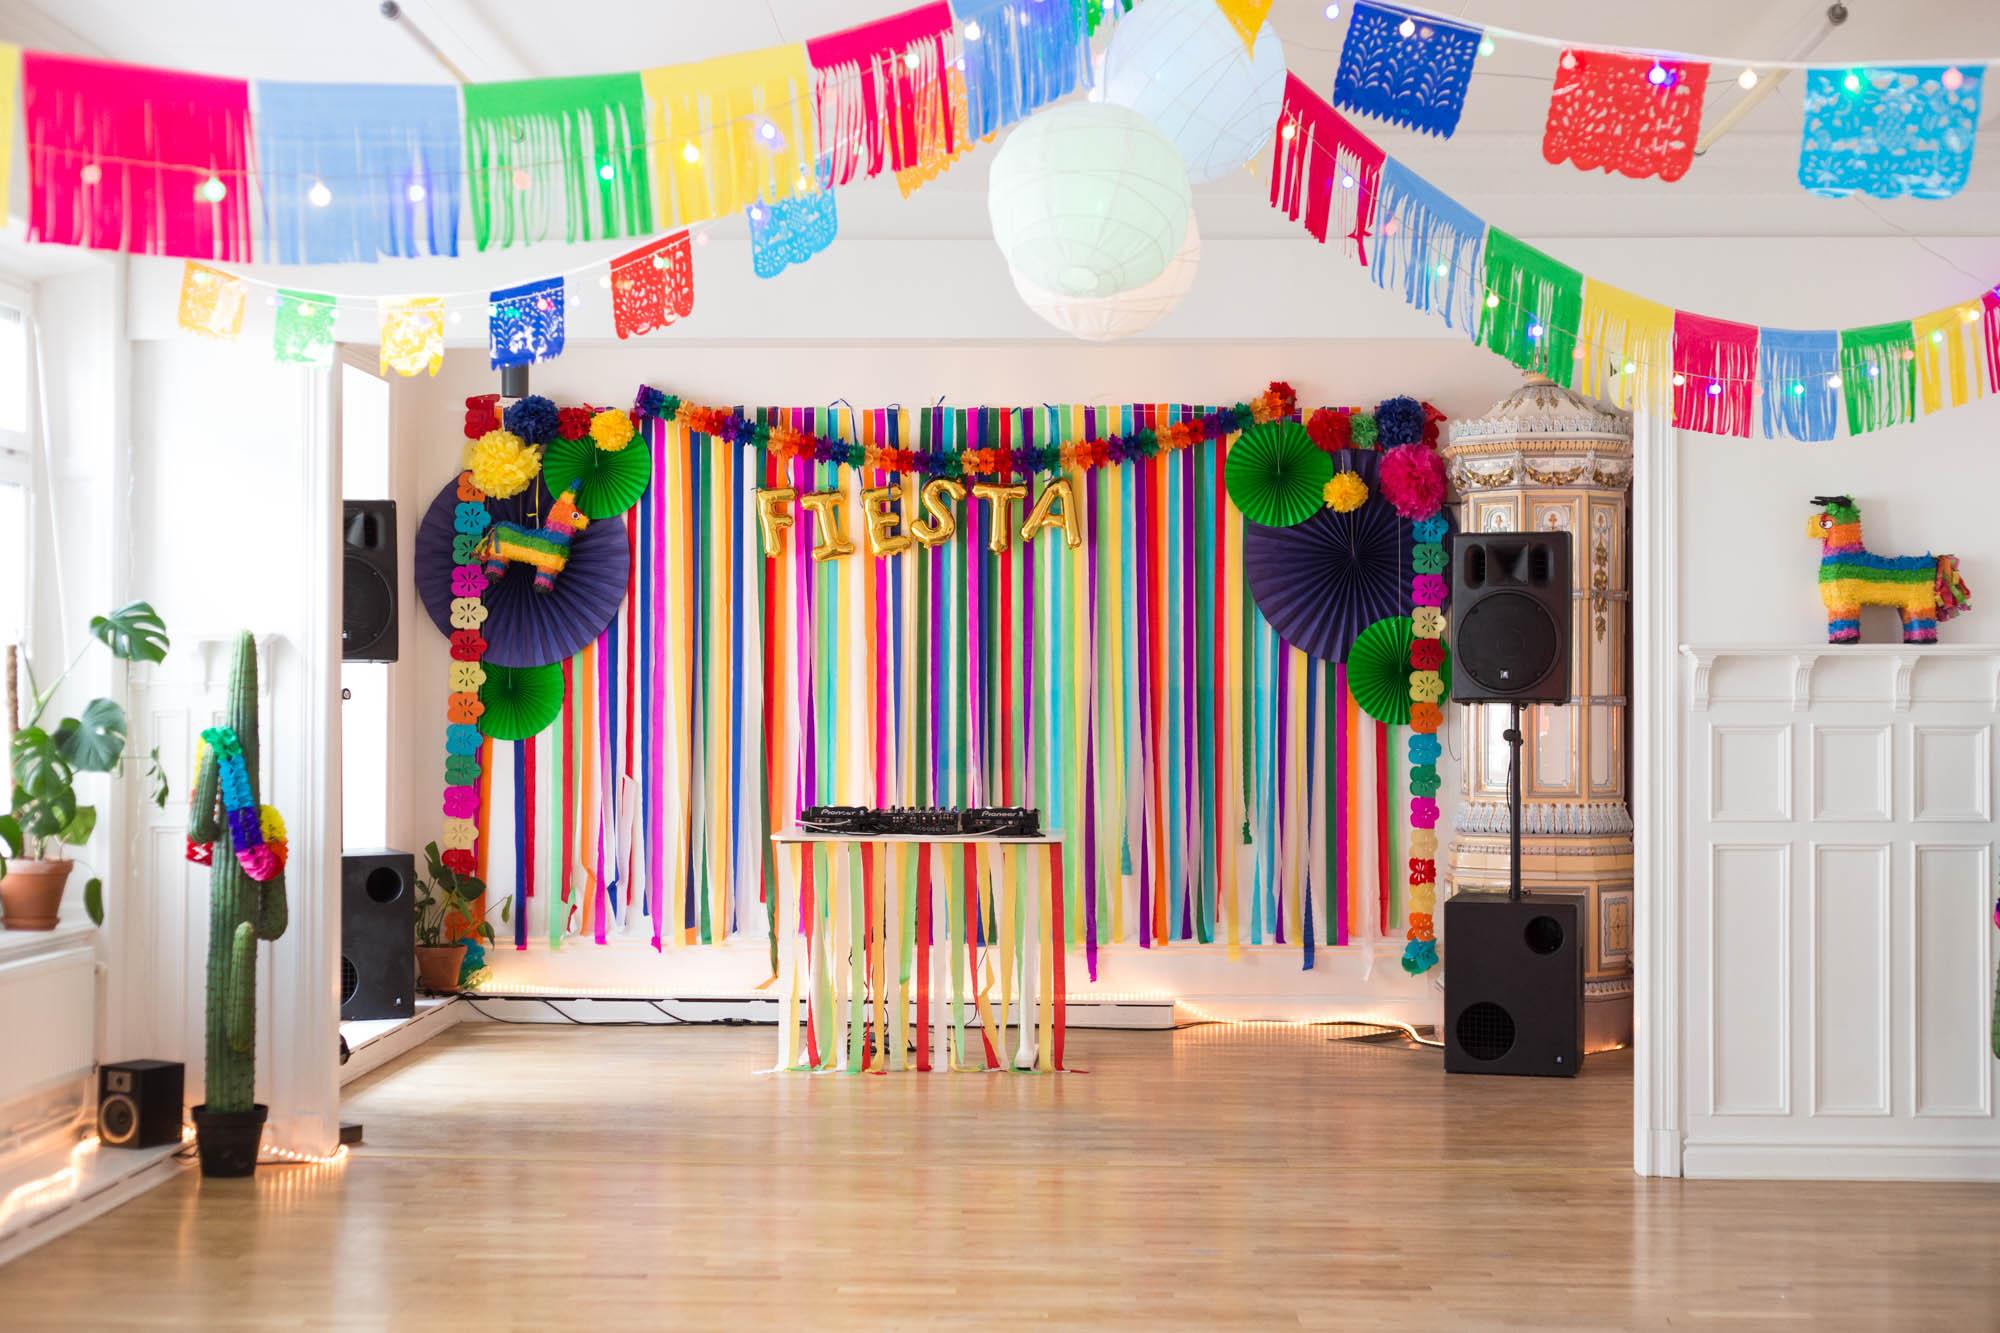 Mexican party decoration idea